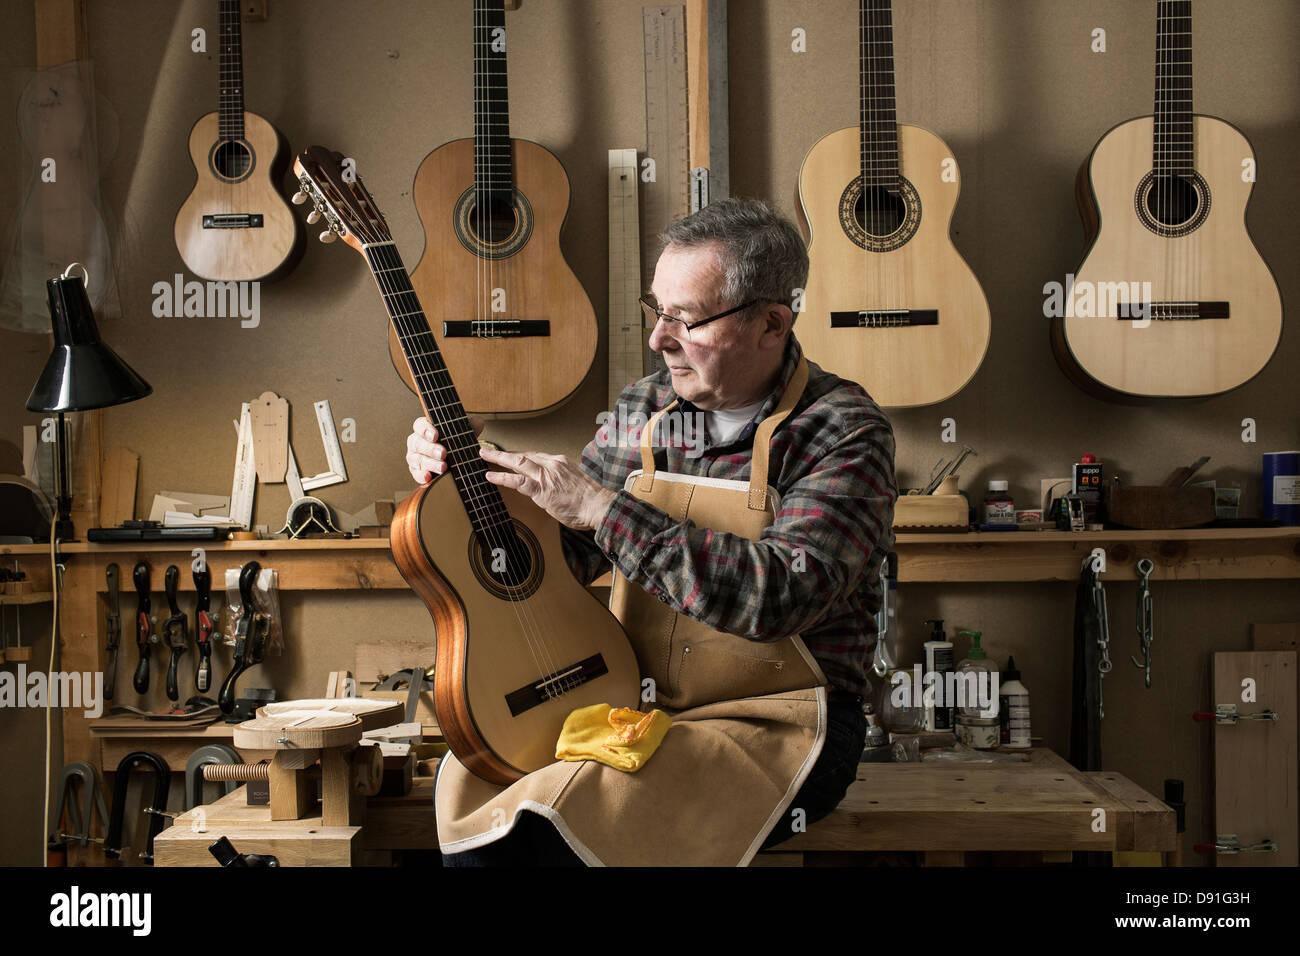 Guitar maker finishing acoustic guitar in workshop - Stock Image